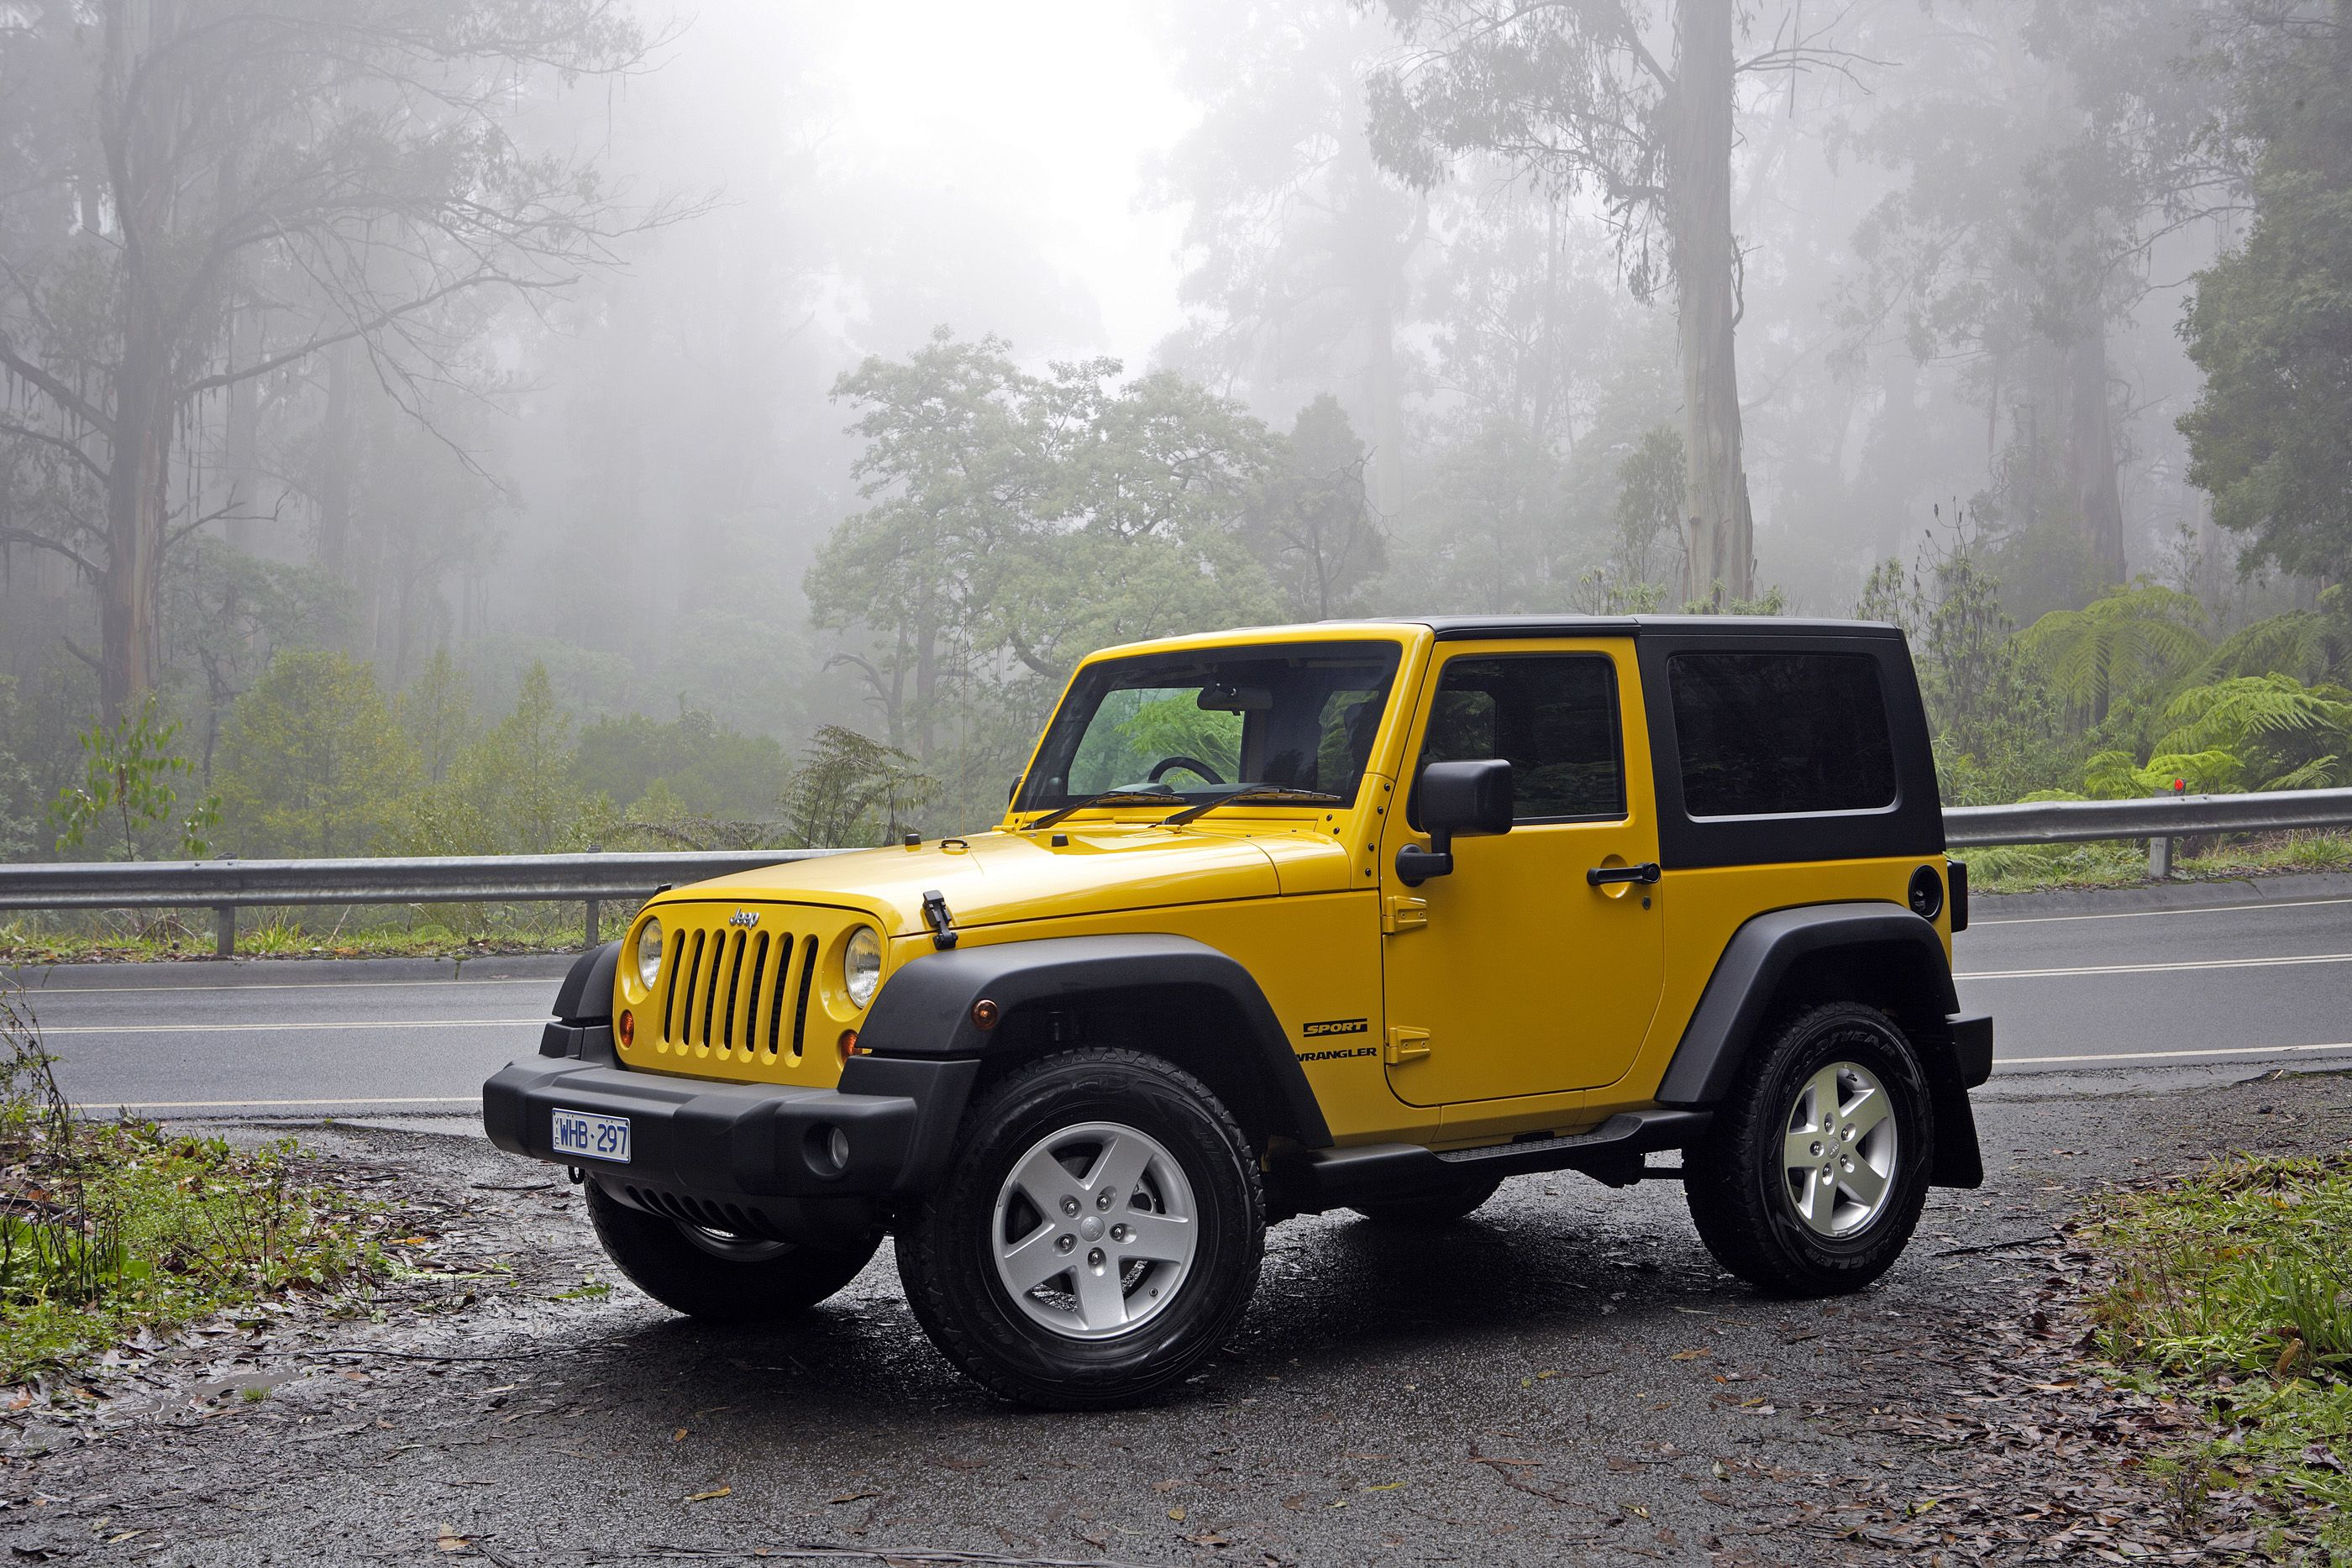 2007 10 Jeep Wrangler Sport Yellow Jeep Wrangler Yellow Jeep Jeep Wrangler